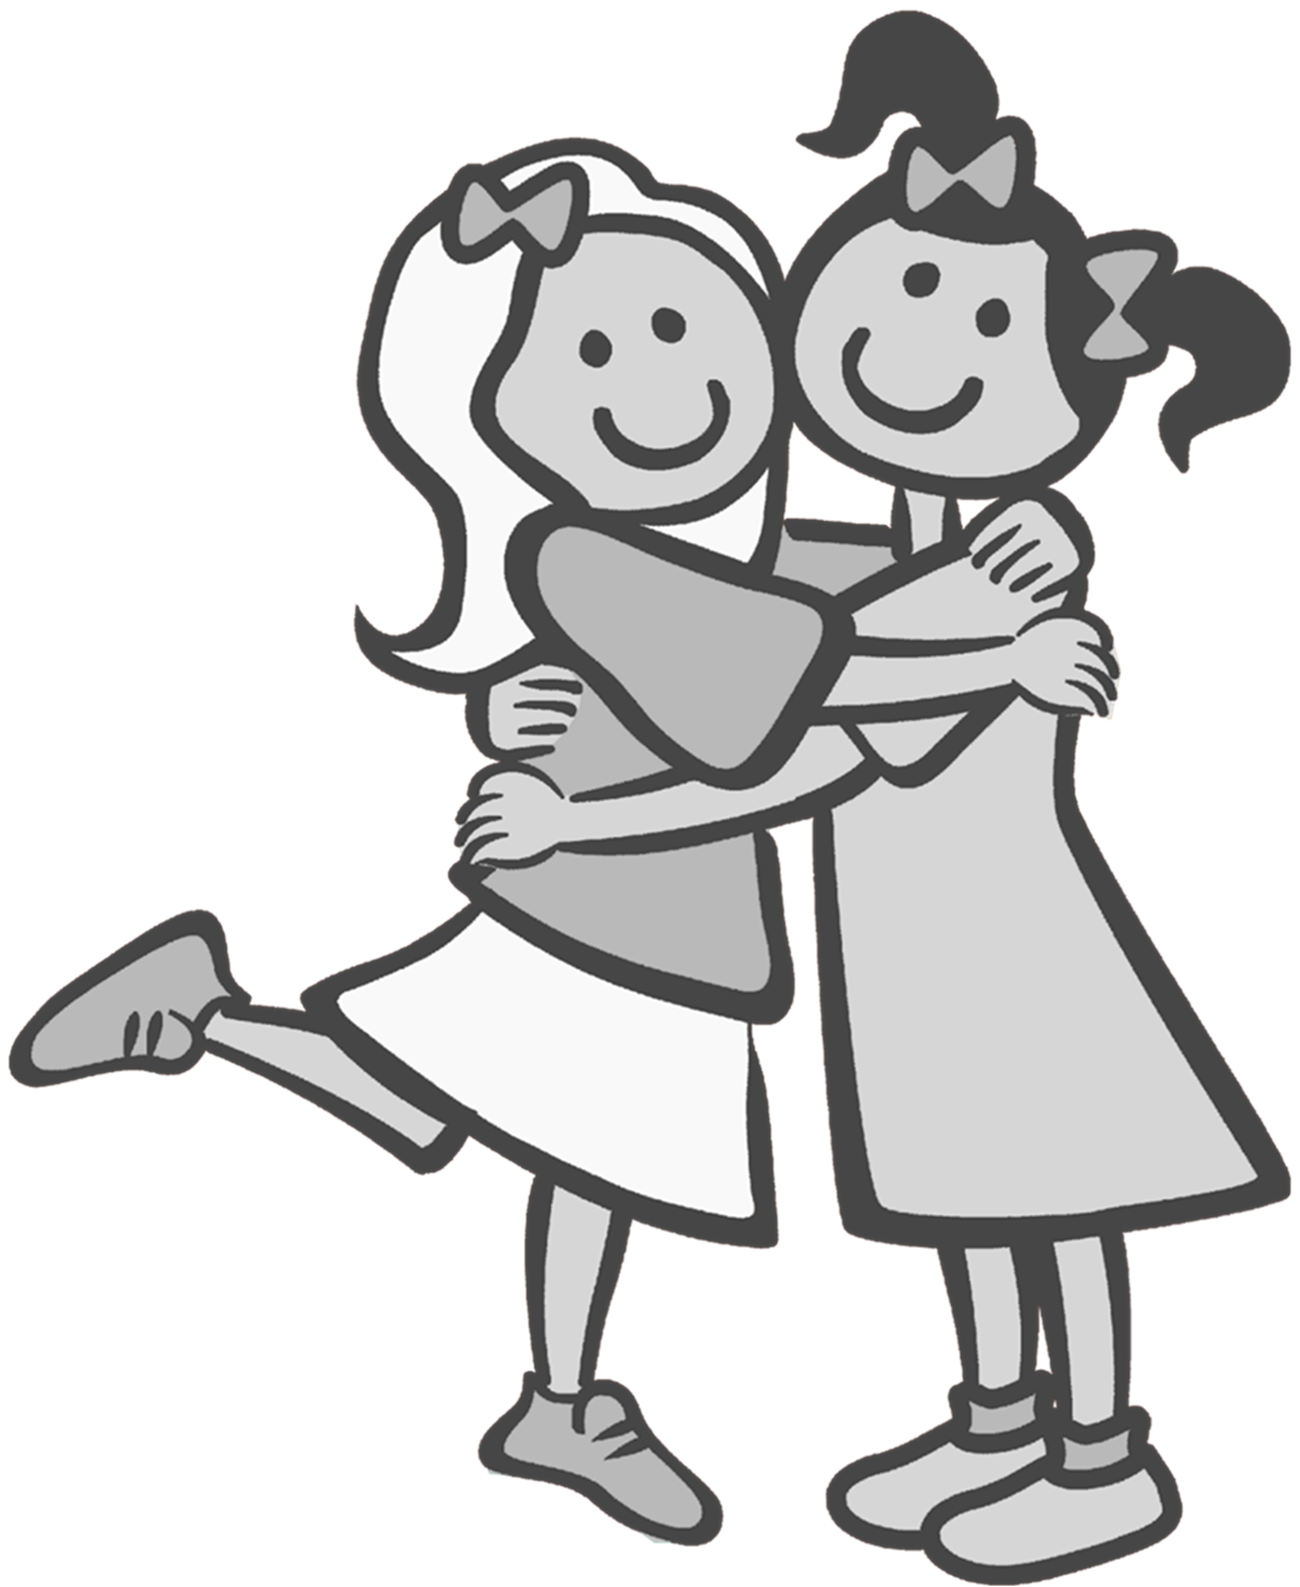 Friends Clip Art Black And White Google Search Art Friend Friends Clipart Stick Figure Drawing